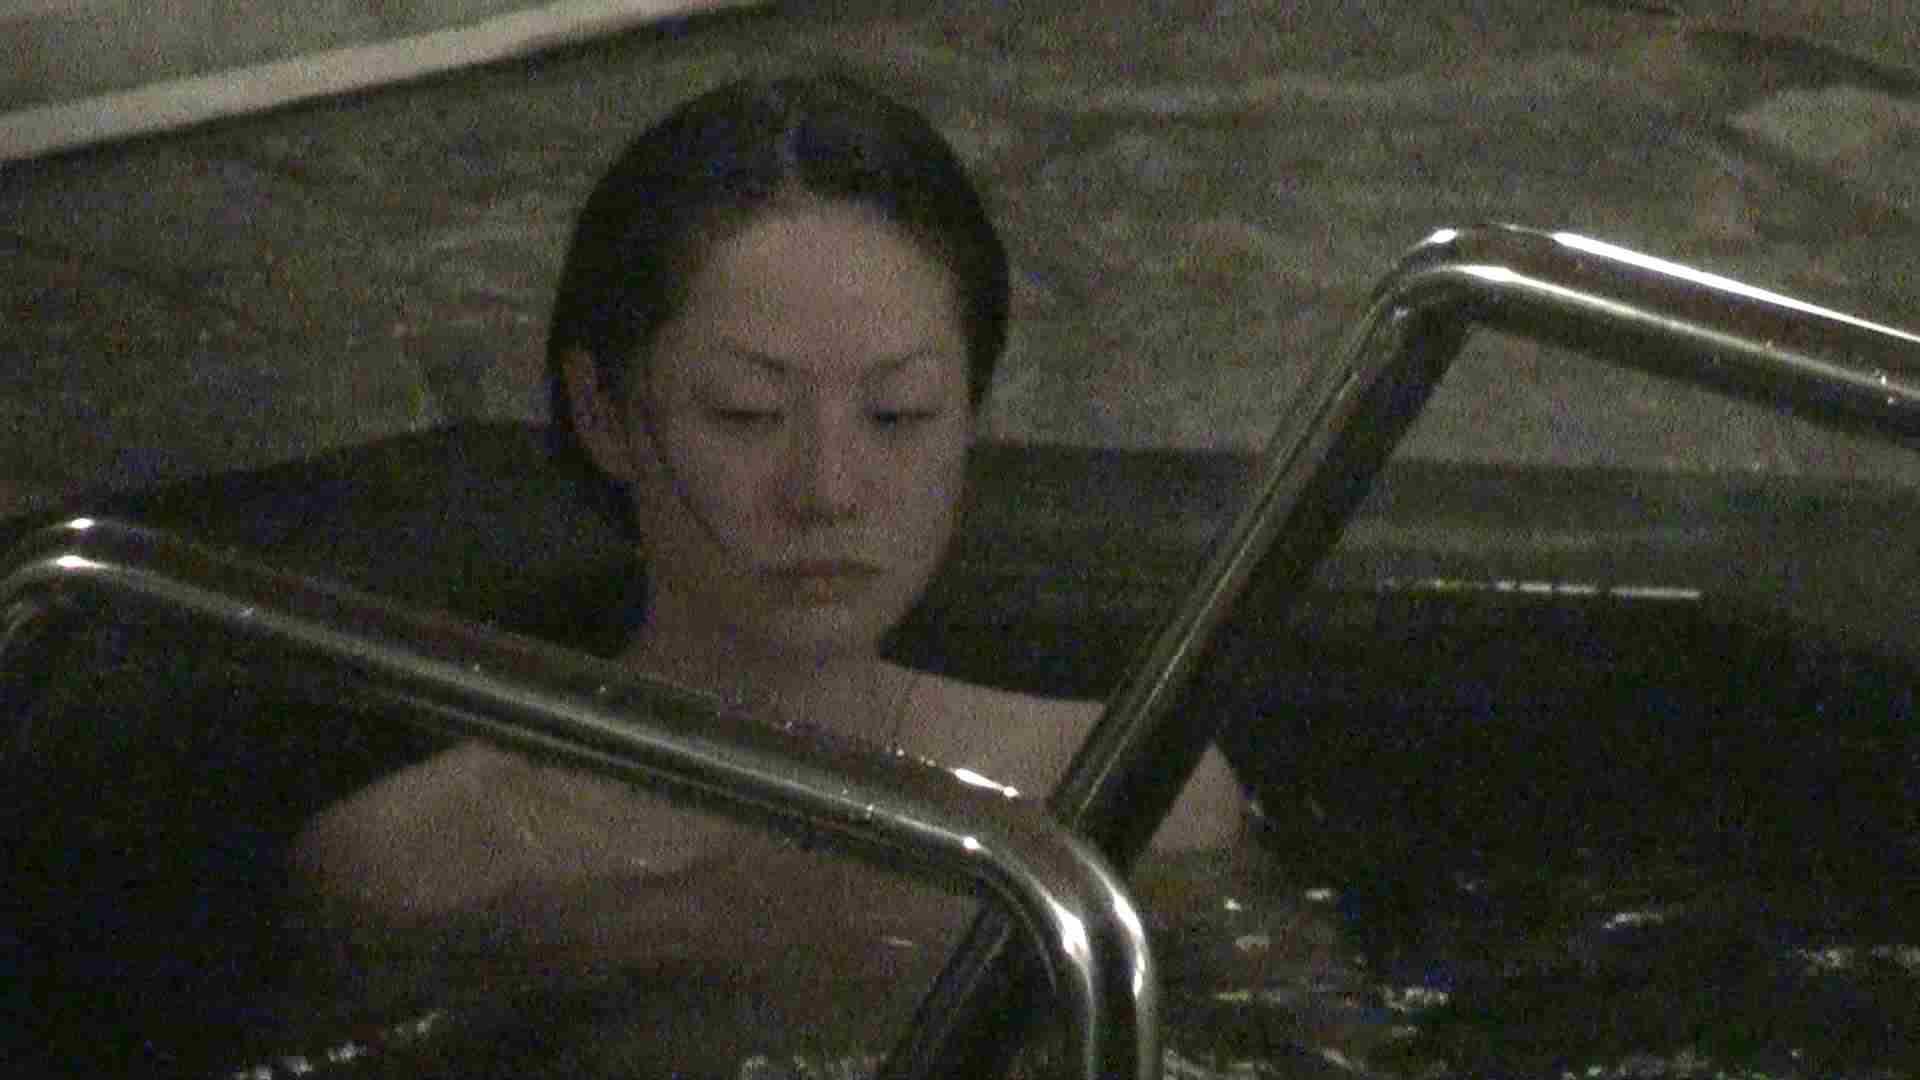 Aquaな露天風呂Vol.318 露天風呂編 | 盗撮シリーズ  109PIX 95